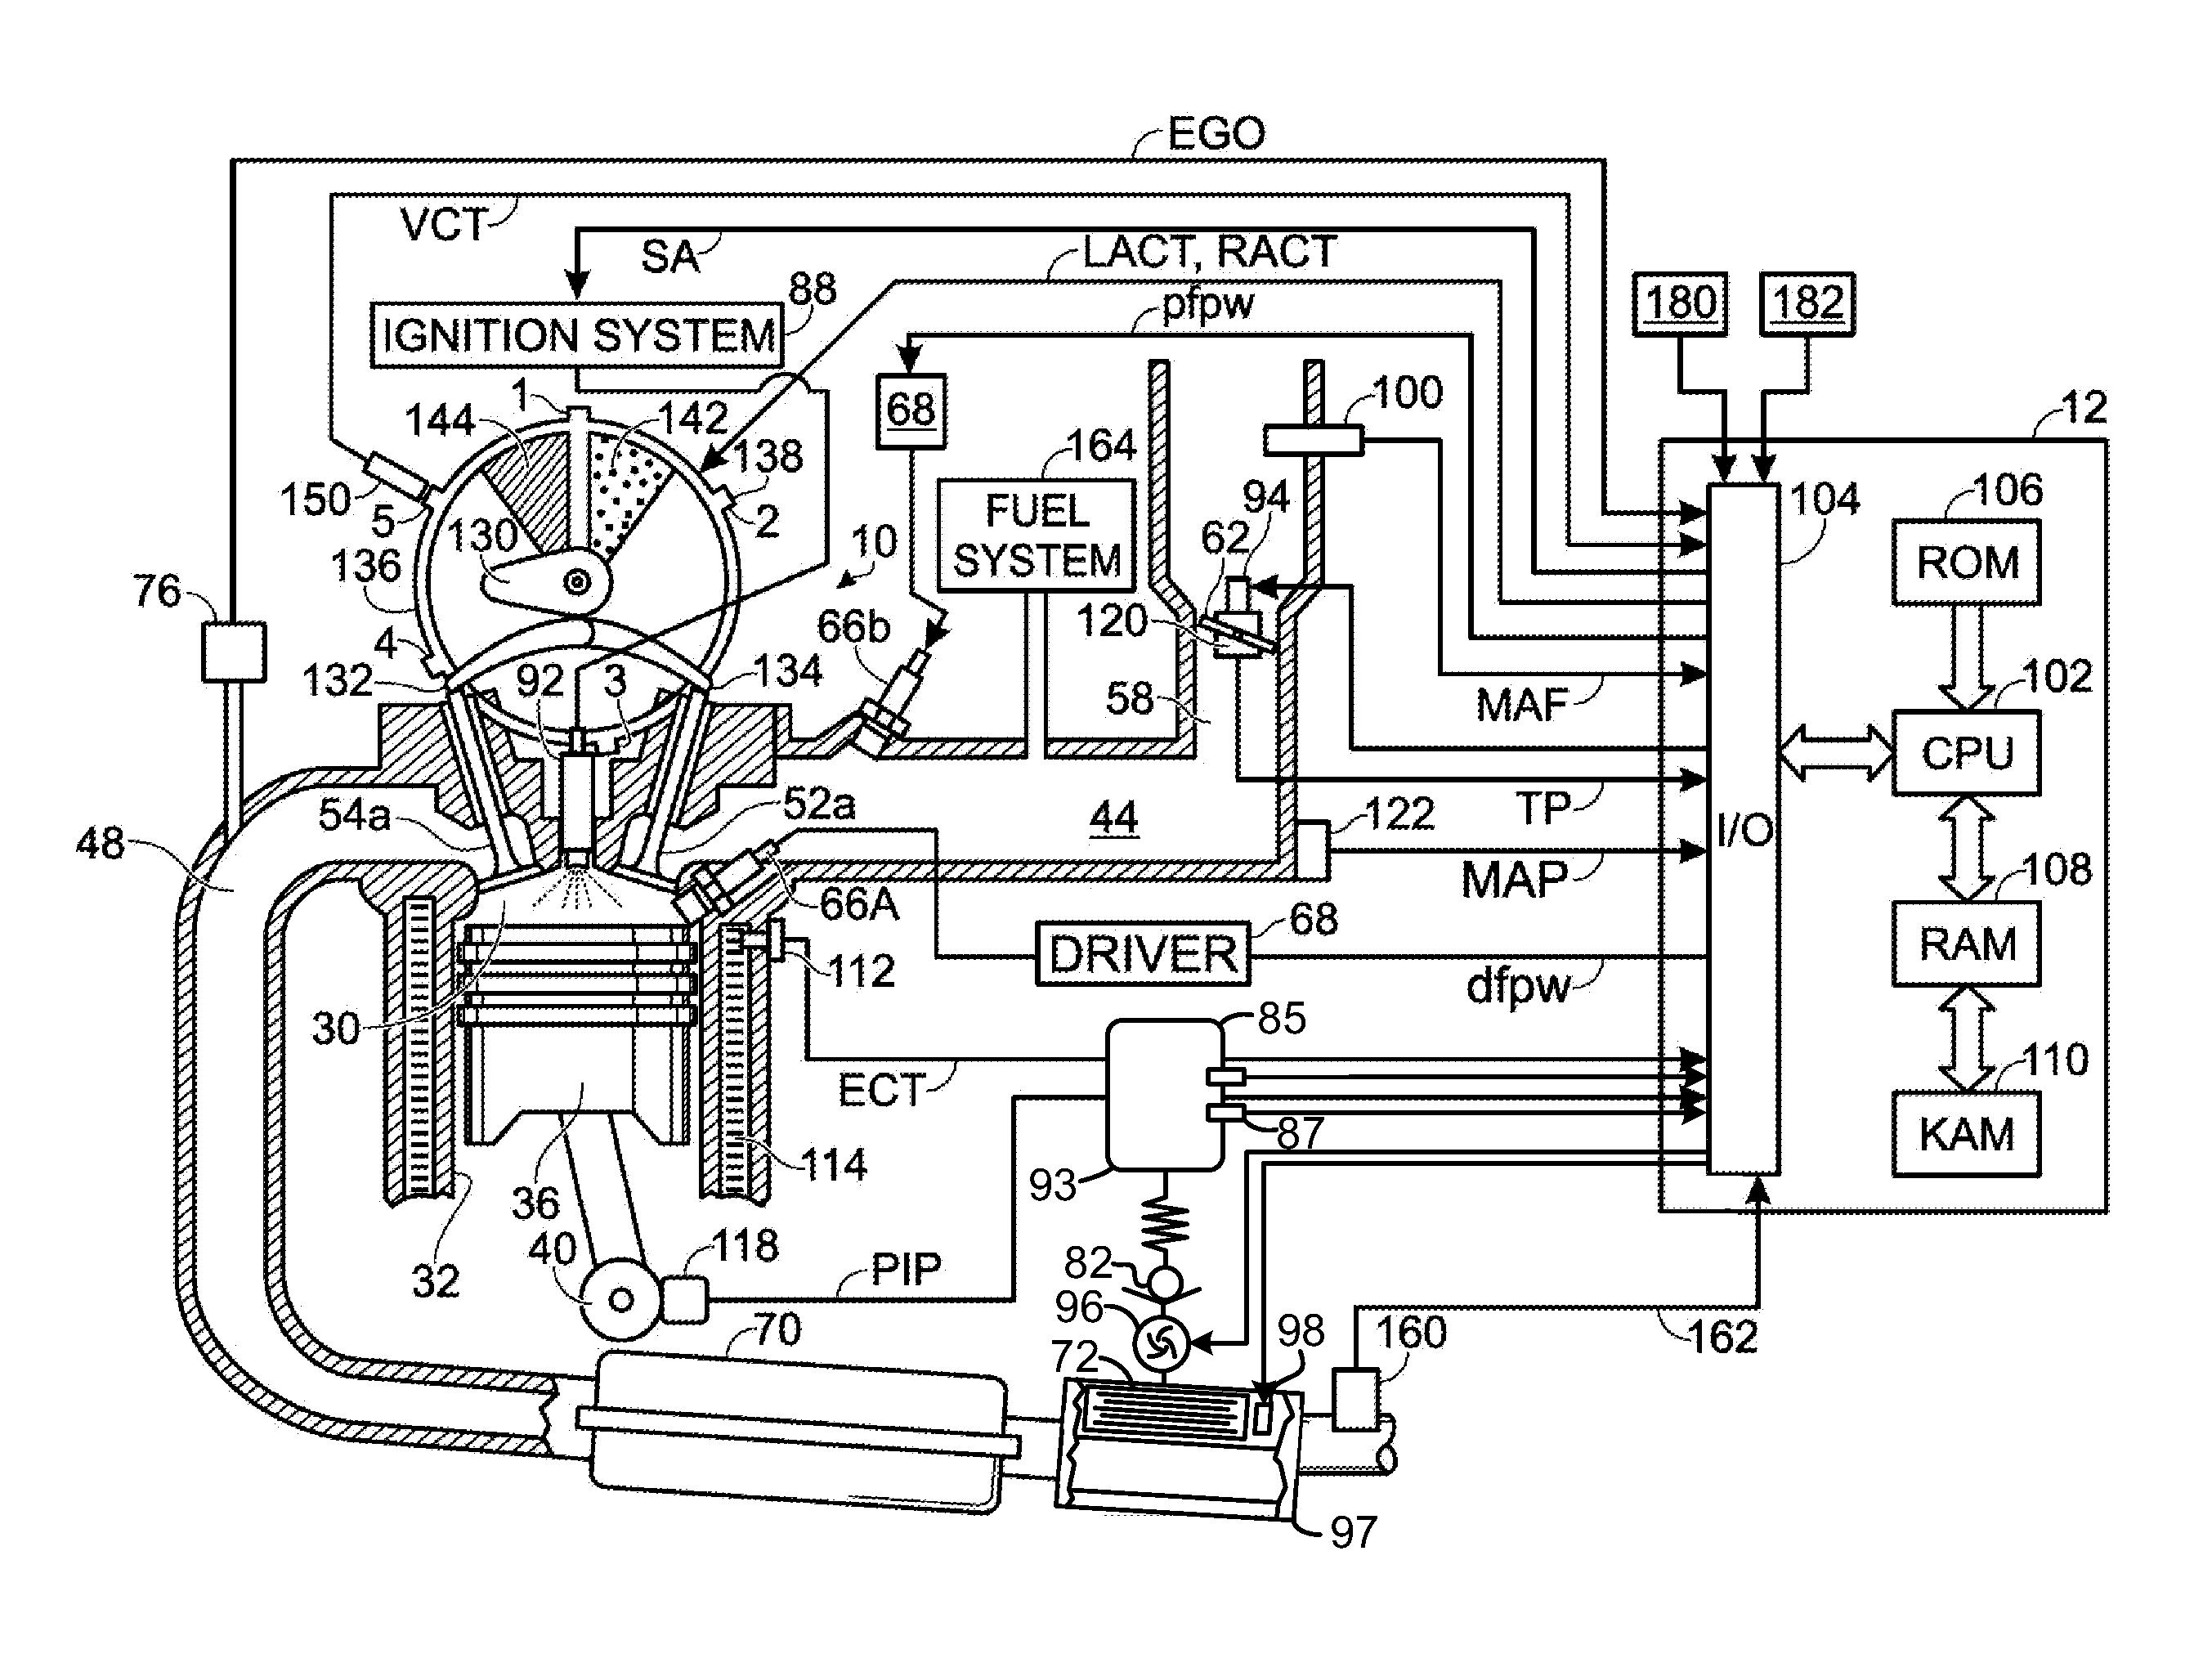 Cat Excavator Wiring Diagrams Wireless S10 Alternator Wiring Diagram